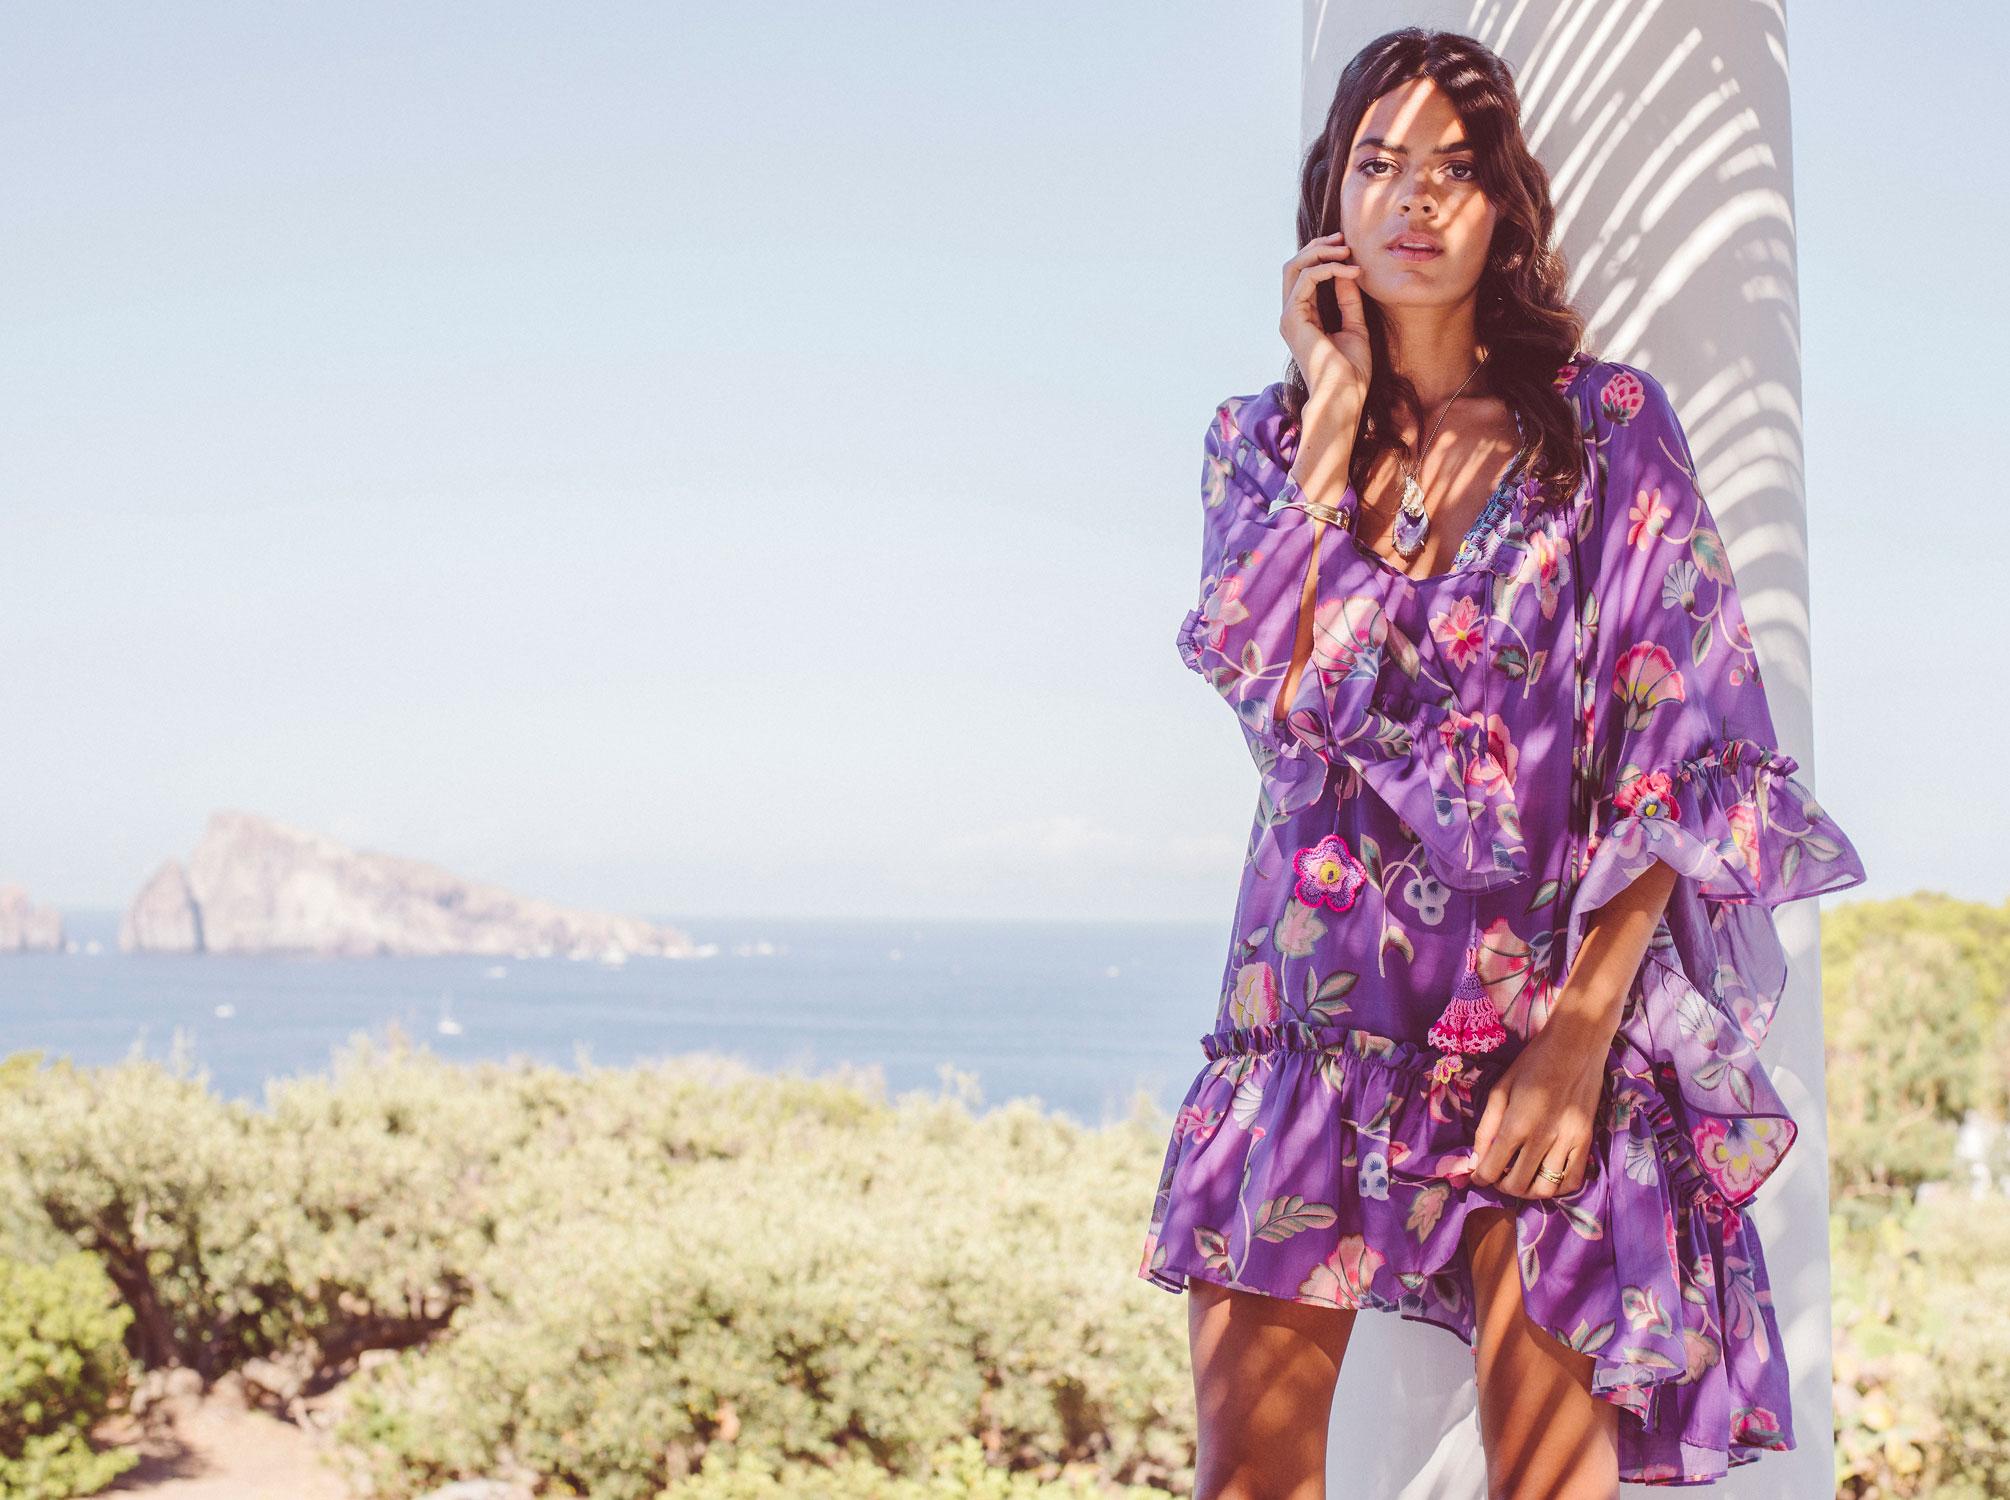 anjuna-resort-couture-beach-couture-summer-dress-made-in-italy-emanuela-corvo-creative-director